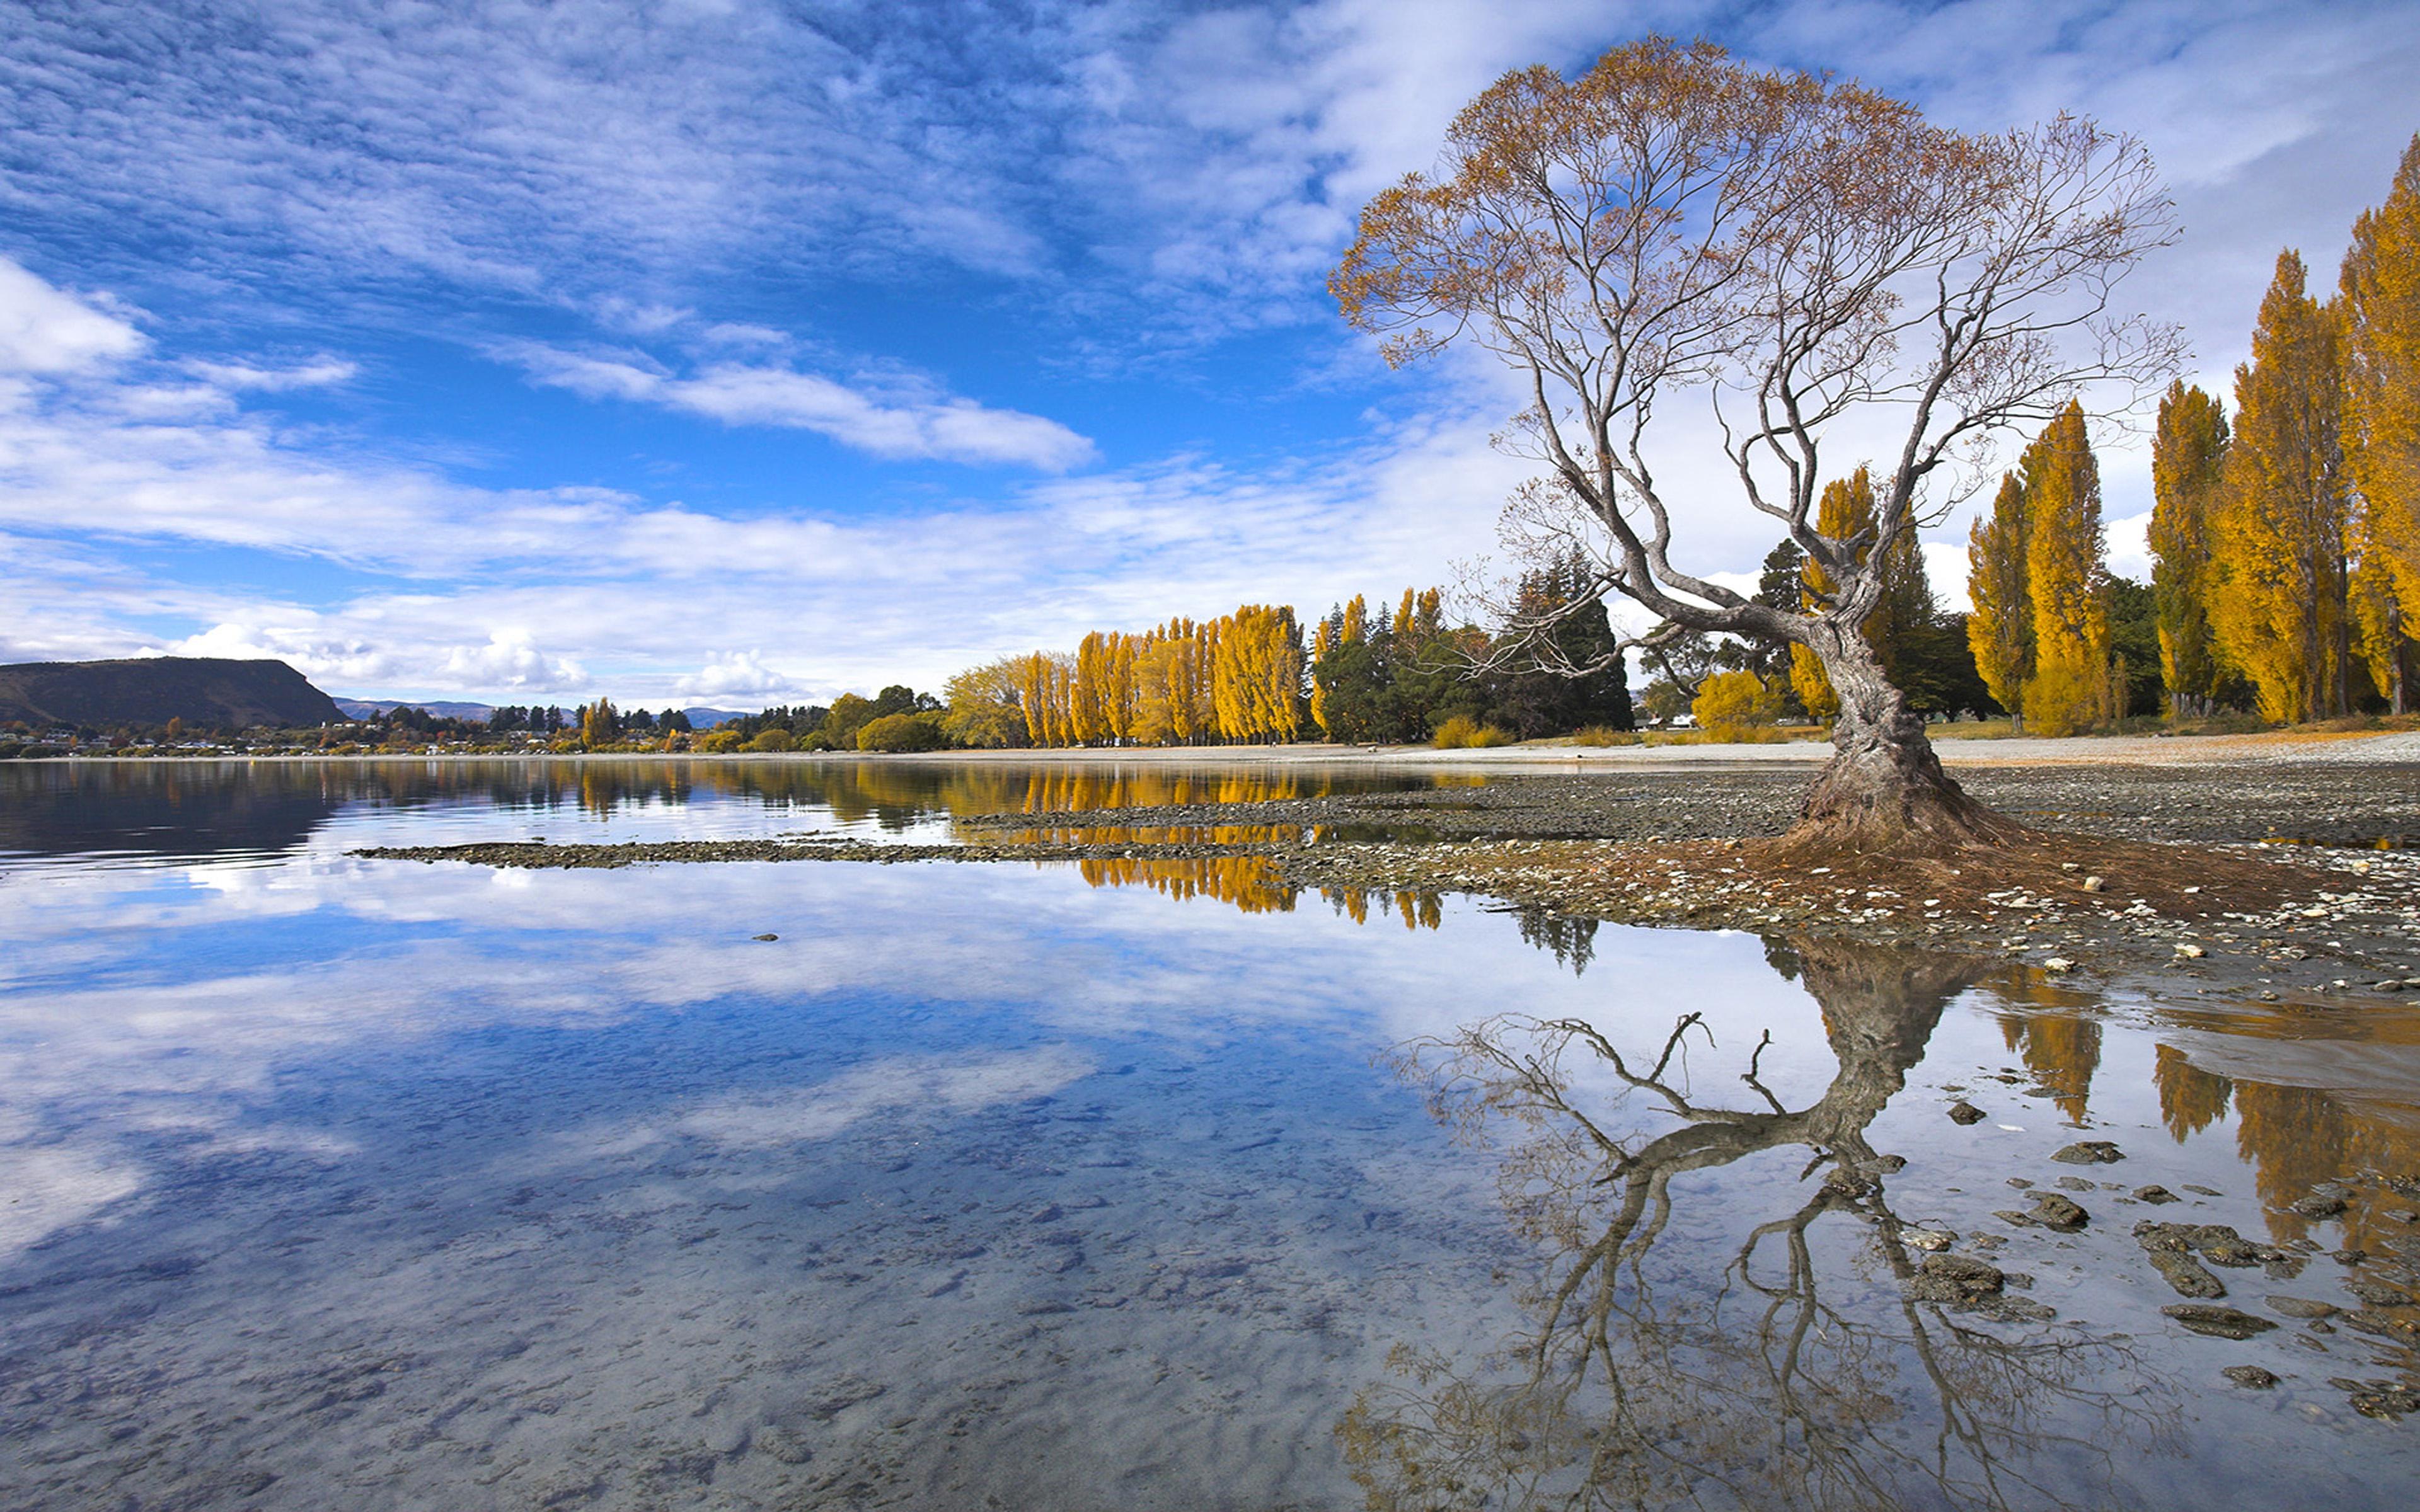 Donald Duck Iphone Wallpaper Spectacular Autumn Colour Beside The Lake At Wanaka Otago